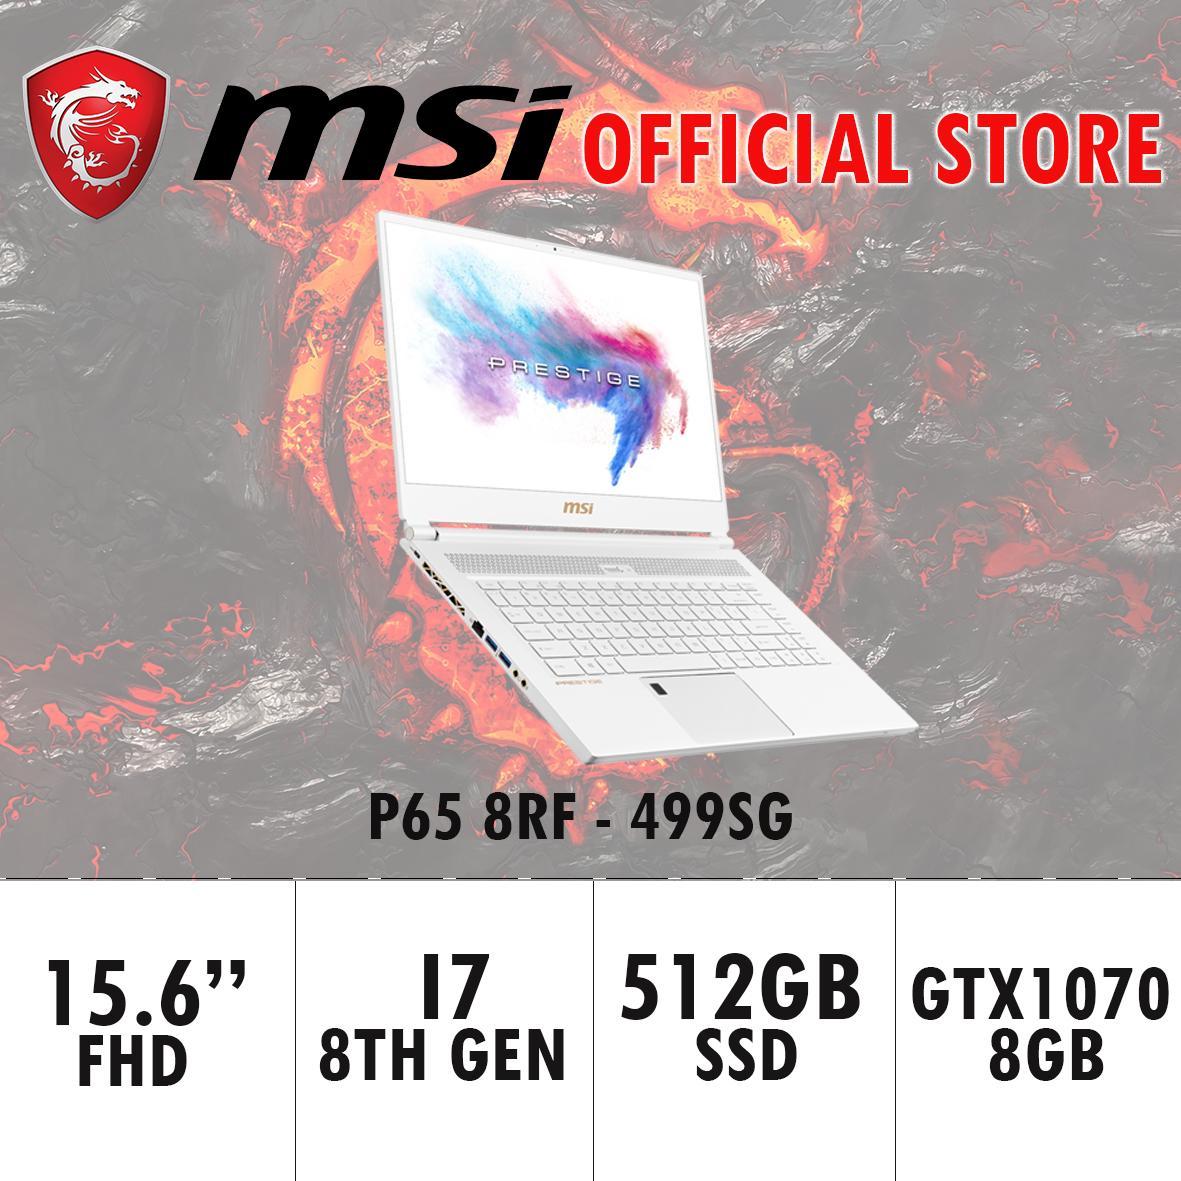 MSI P65 GTX1070 8RF – 499SG (i7-8750H / 16GB / 512GB SSD / WIN 10) 15.6 FHD with 144Hz Gaming Laptop